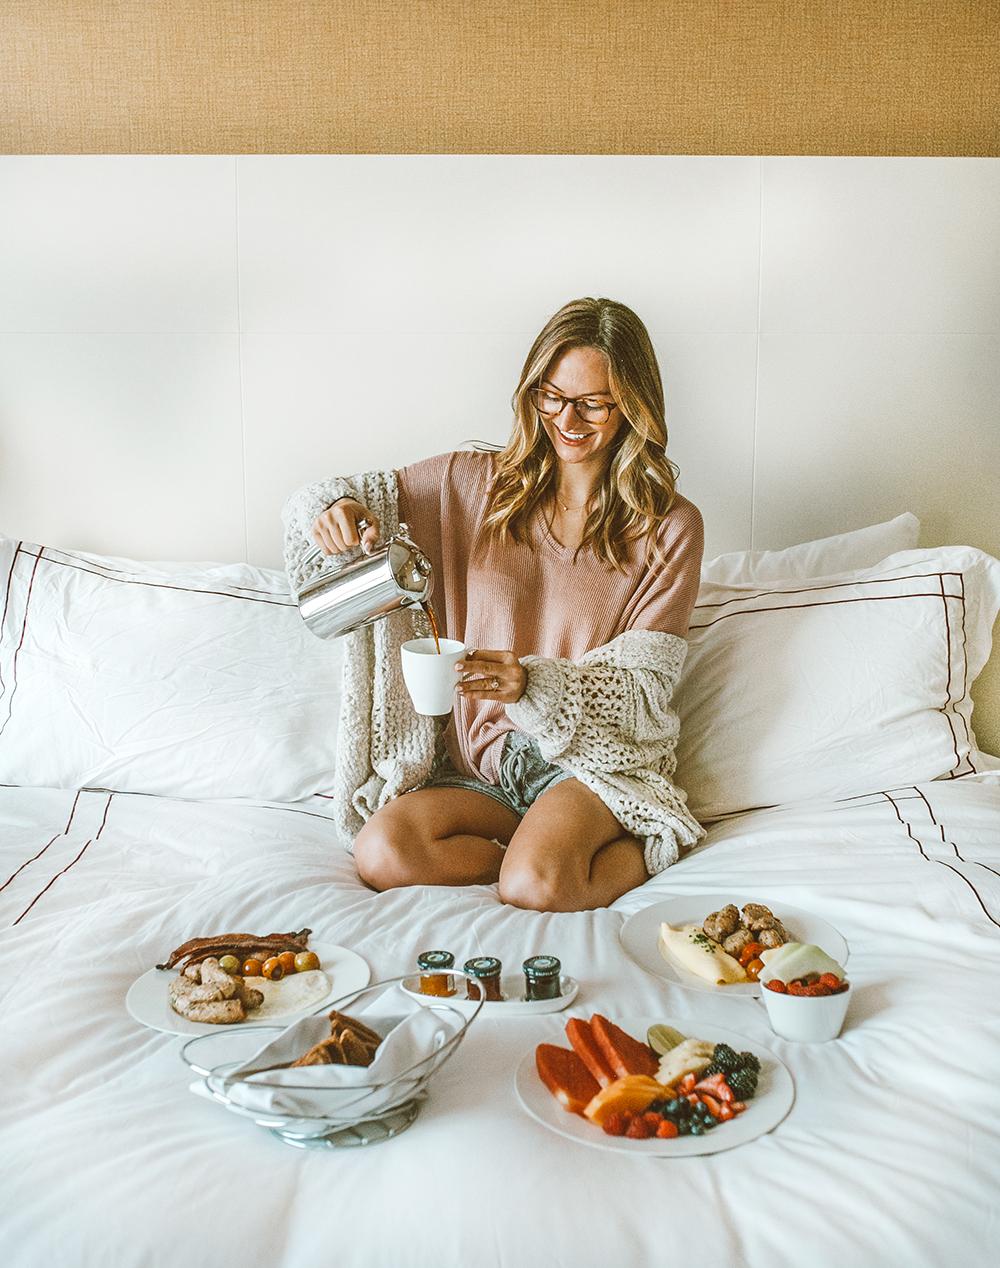 livvyland-blog-olivia-watson-austin-texas-lifestyle-blogger-fairmont-hotel-atx-downtown-room-service-breakfast-in-bed-2